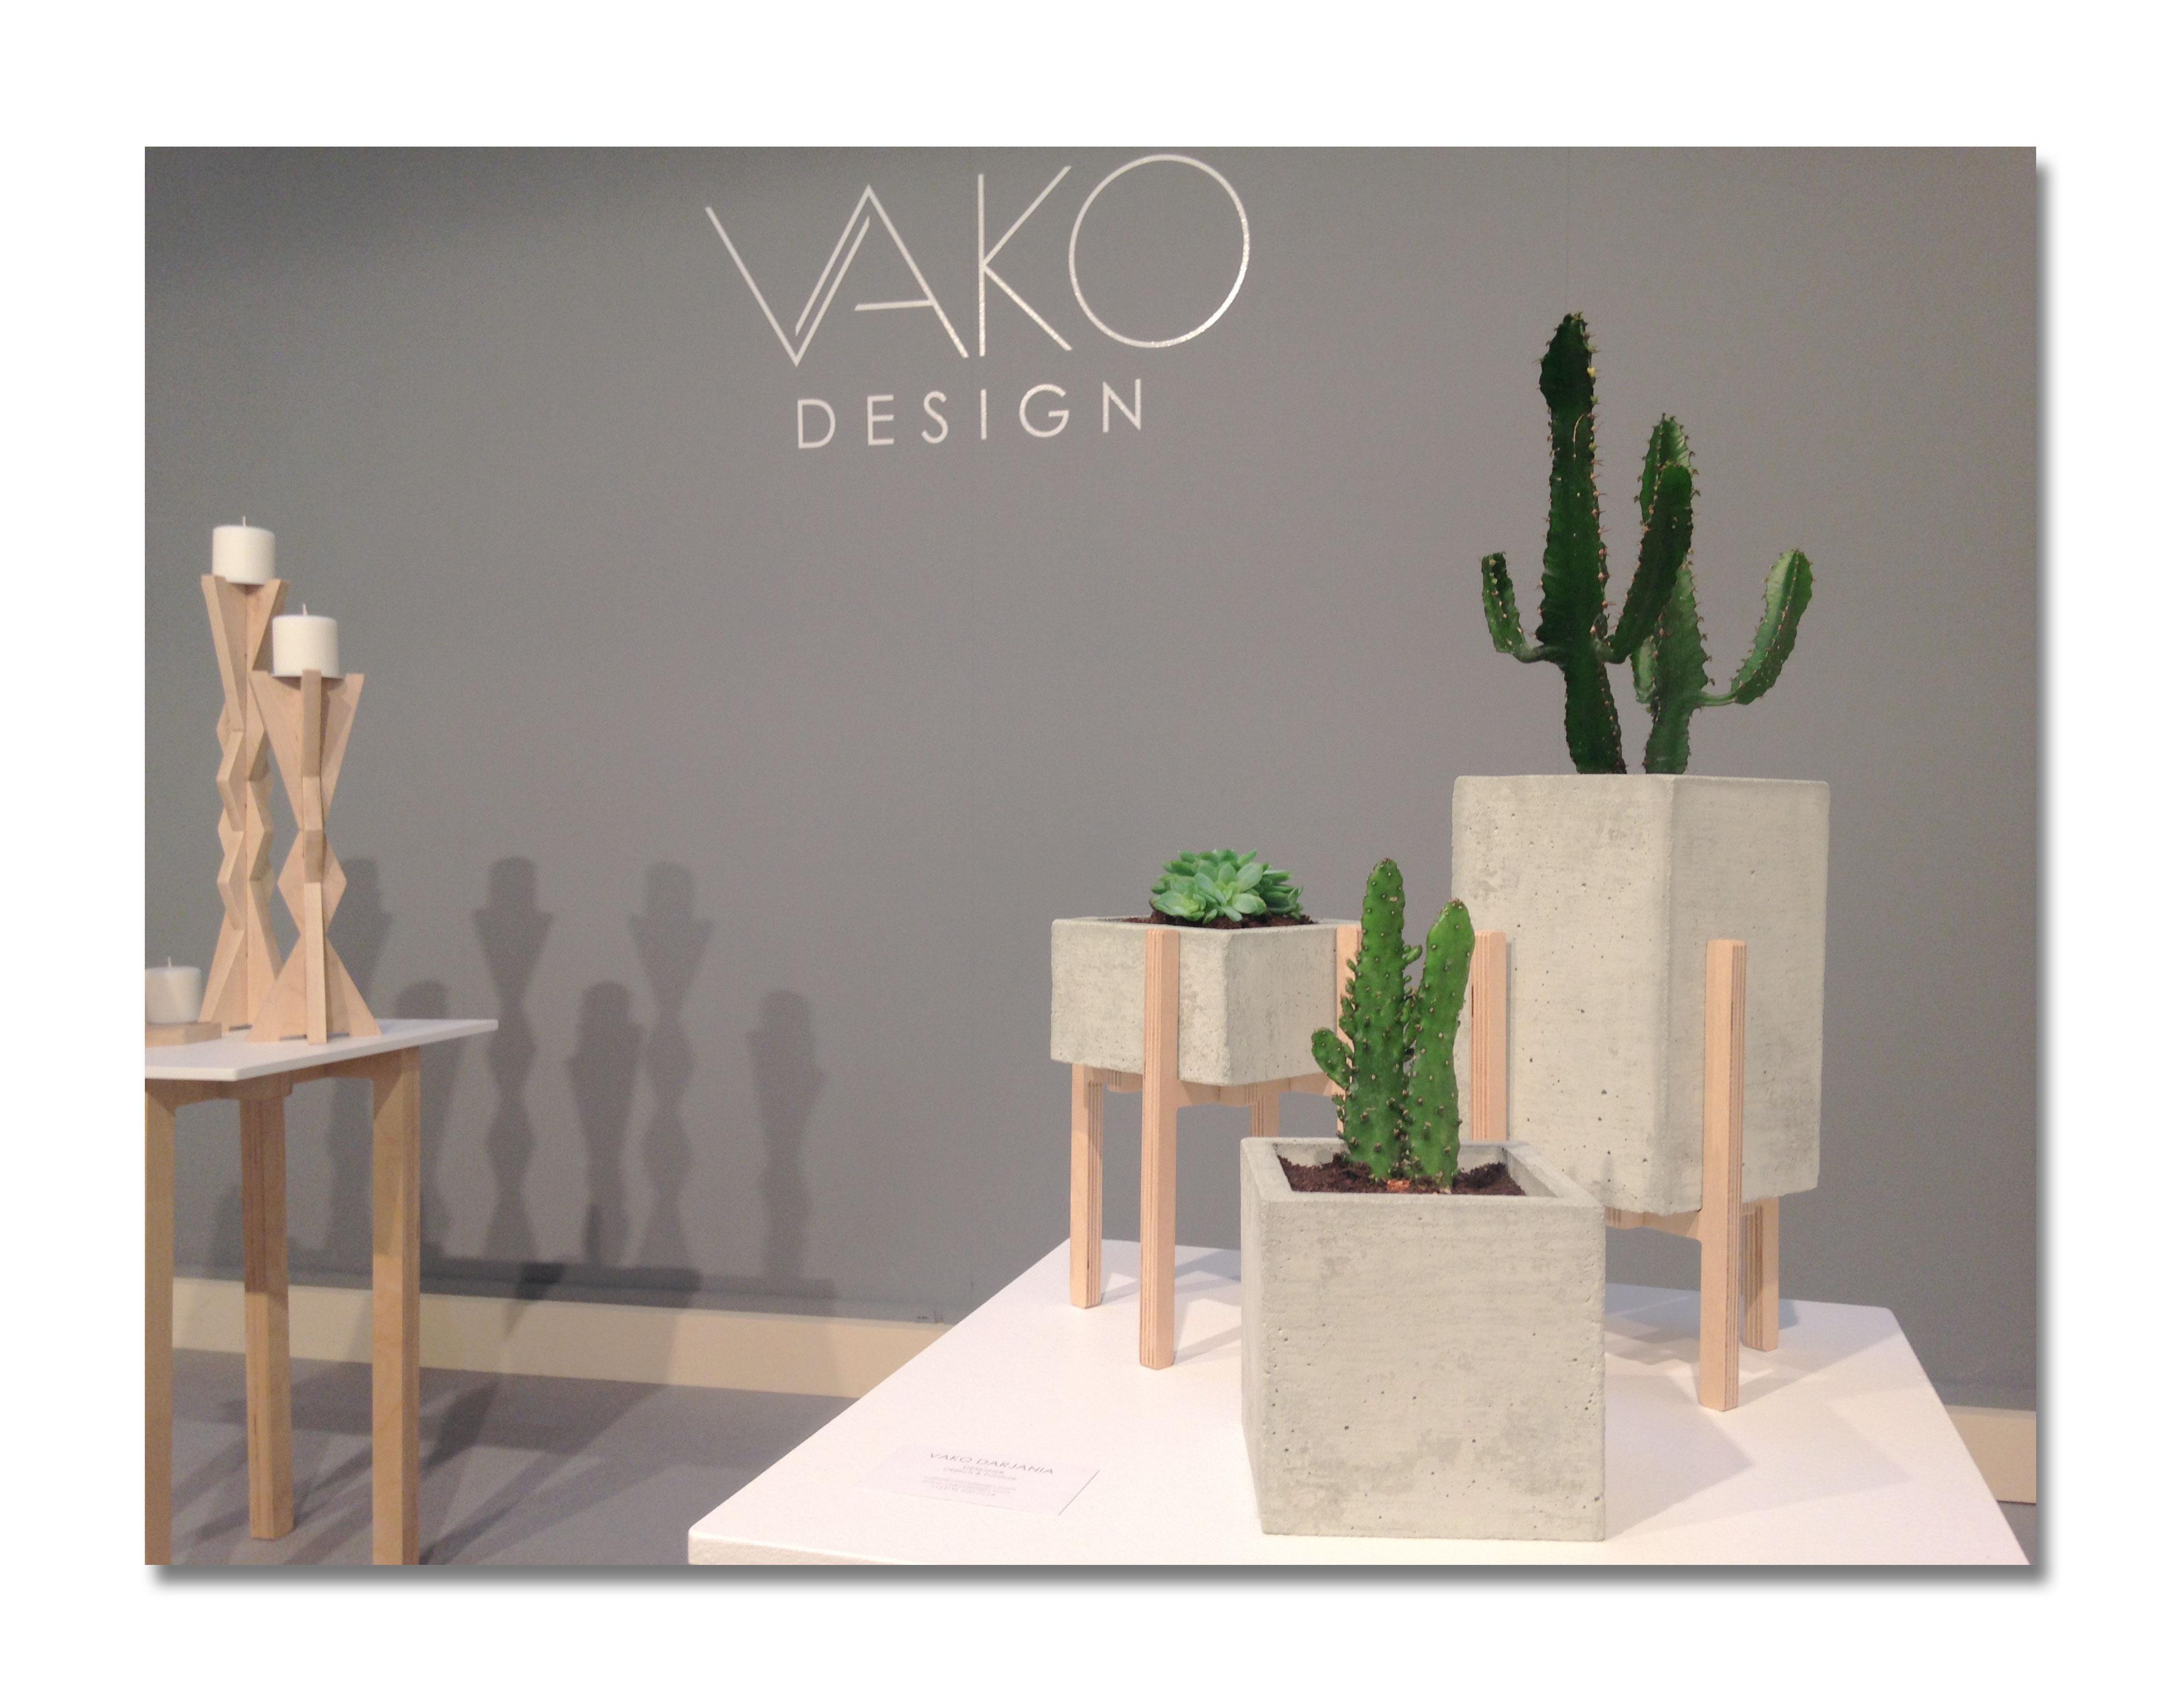 Vako Design